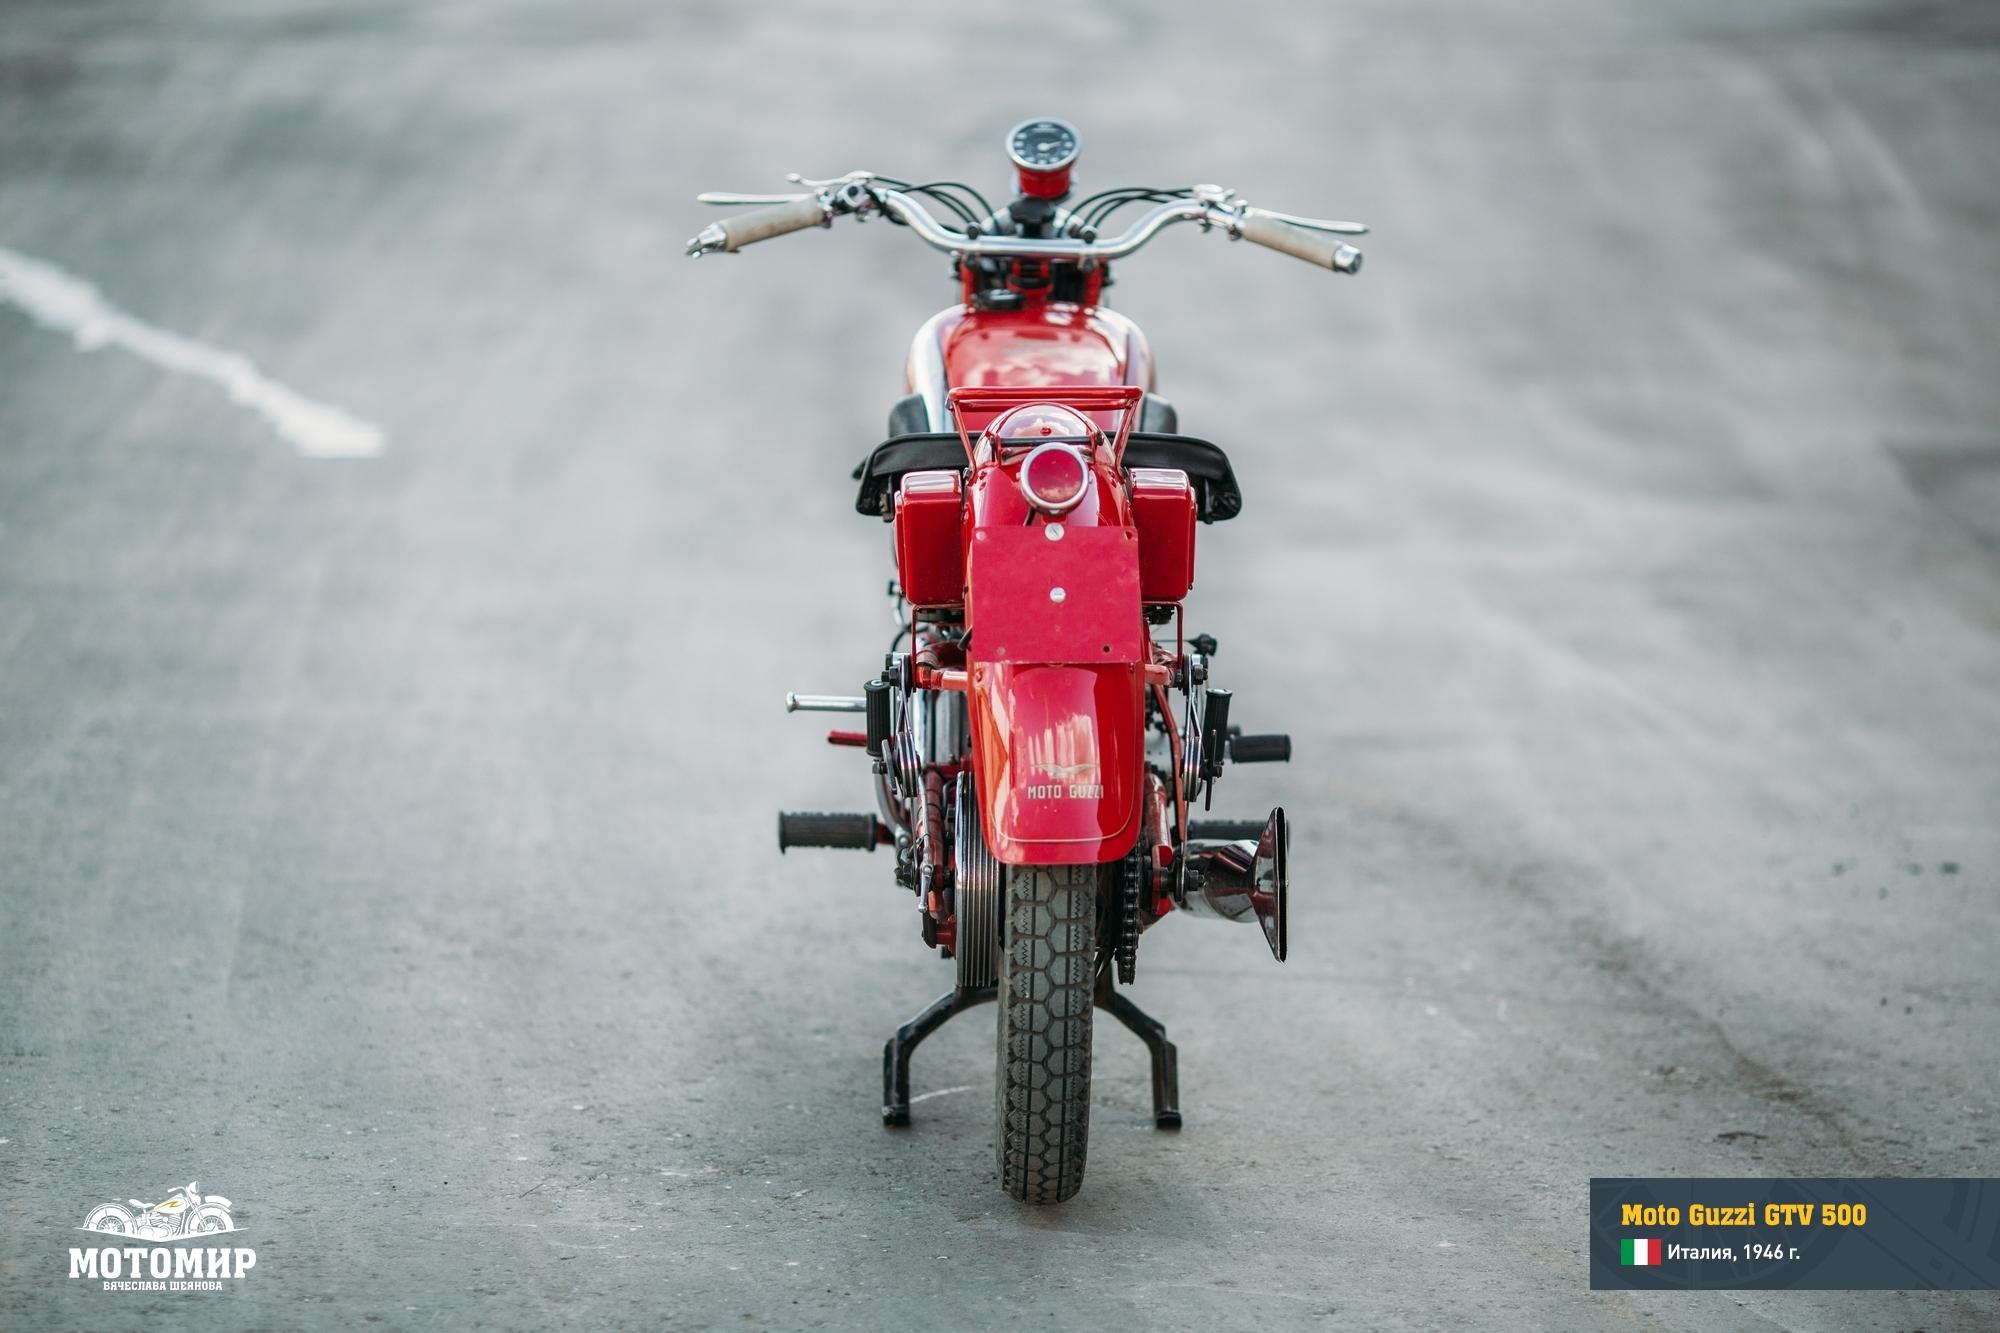 moto-guzzi-gtv-500-201509-web-03